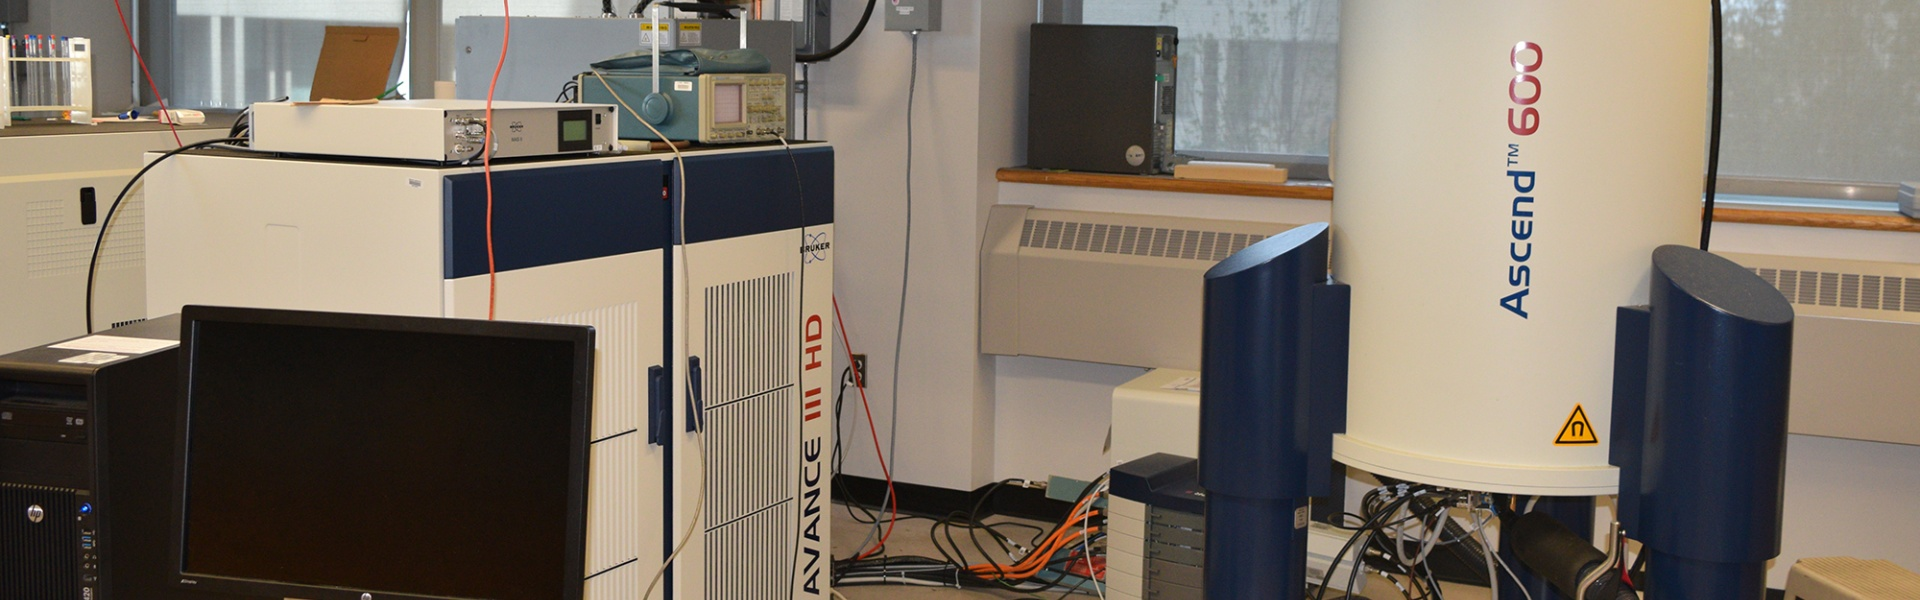 NMR Facility